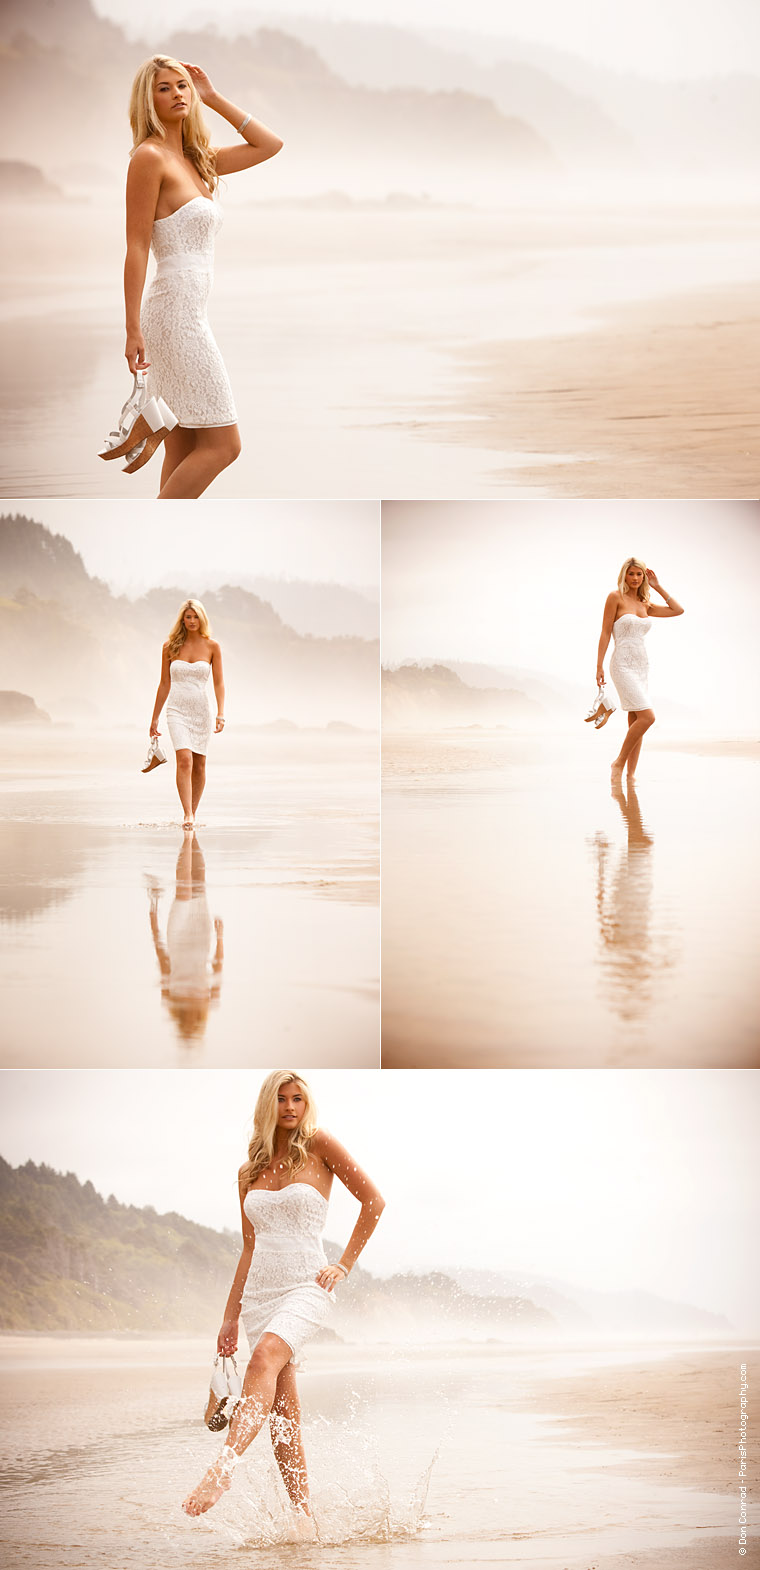 Oregon Coast Jul 26, 2012 © Paris Photography Model - Kenzie Smith